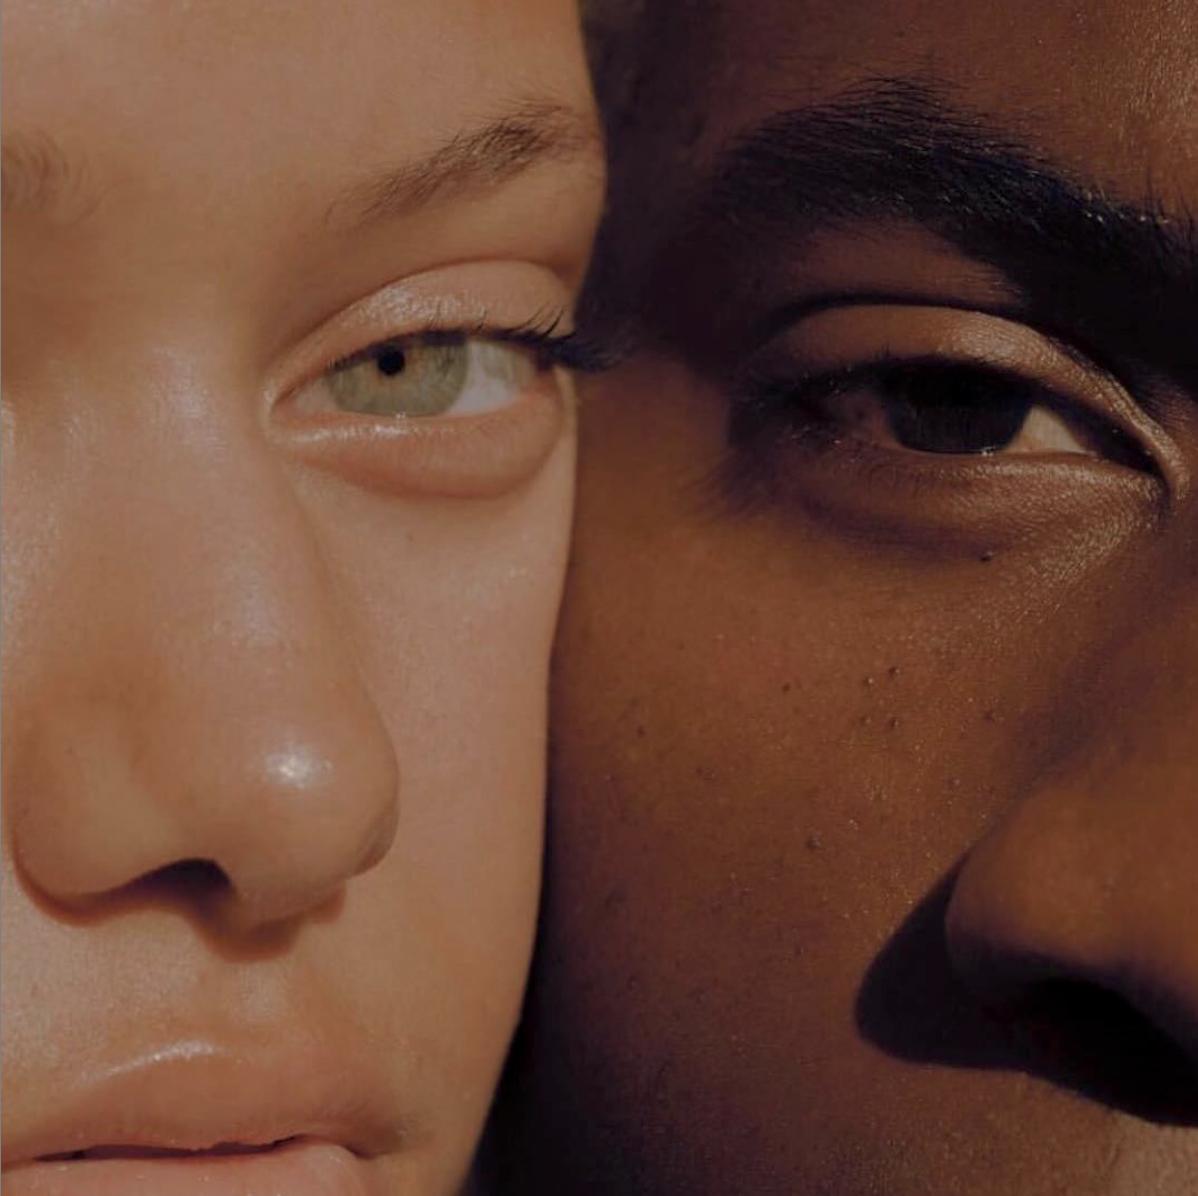 HALO AESTHETICS BAR - West Hollywood's Best-Kept Beauty Secret